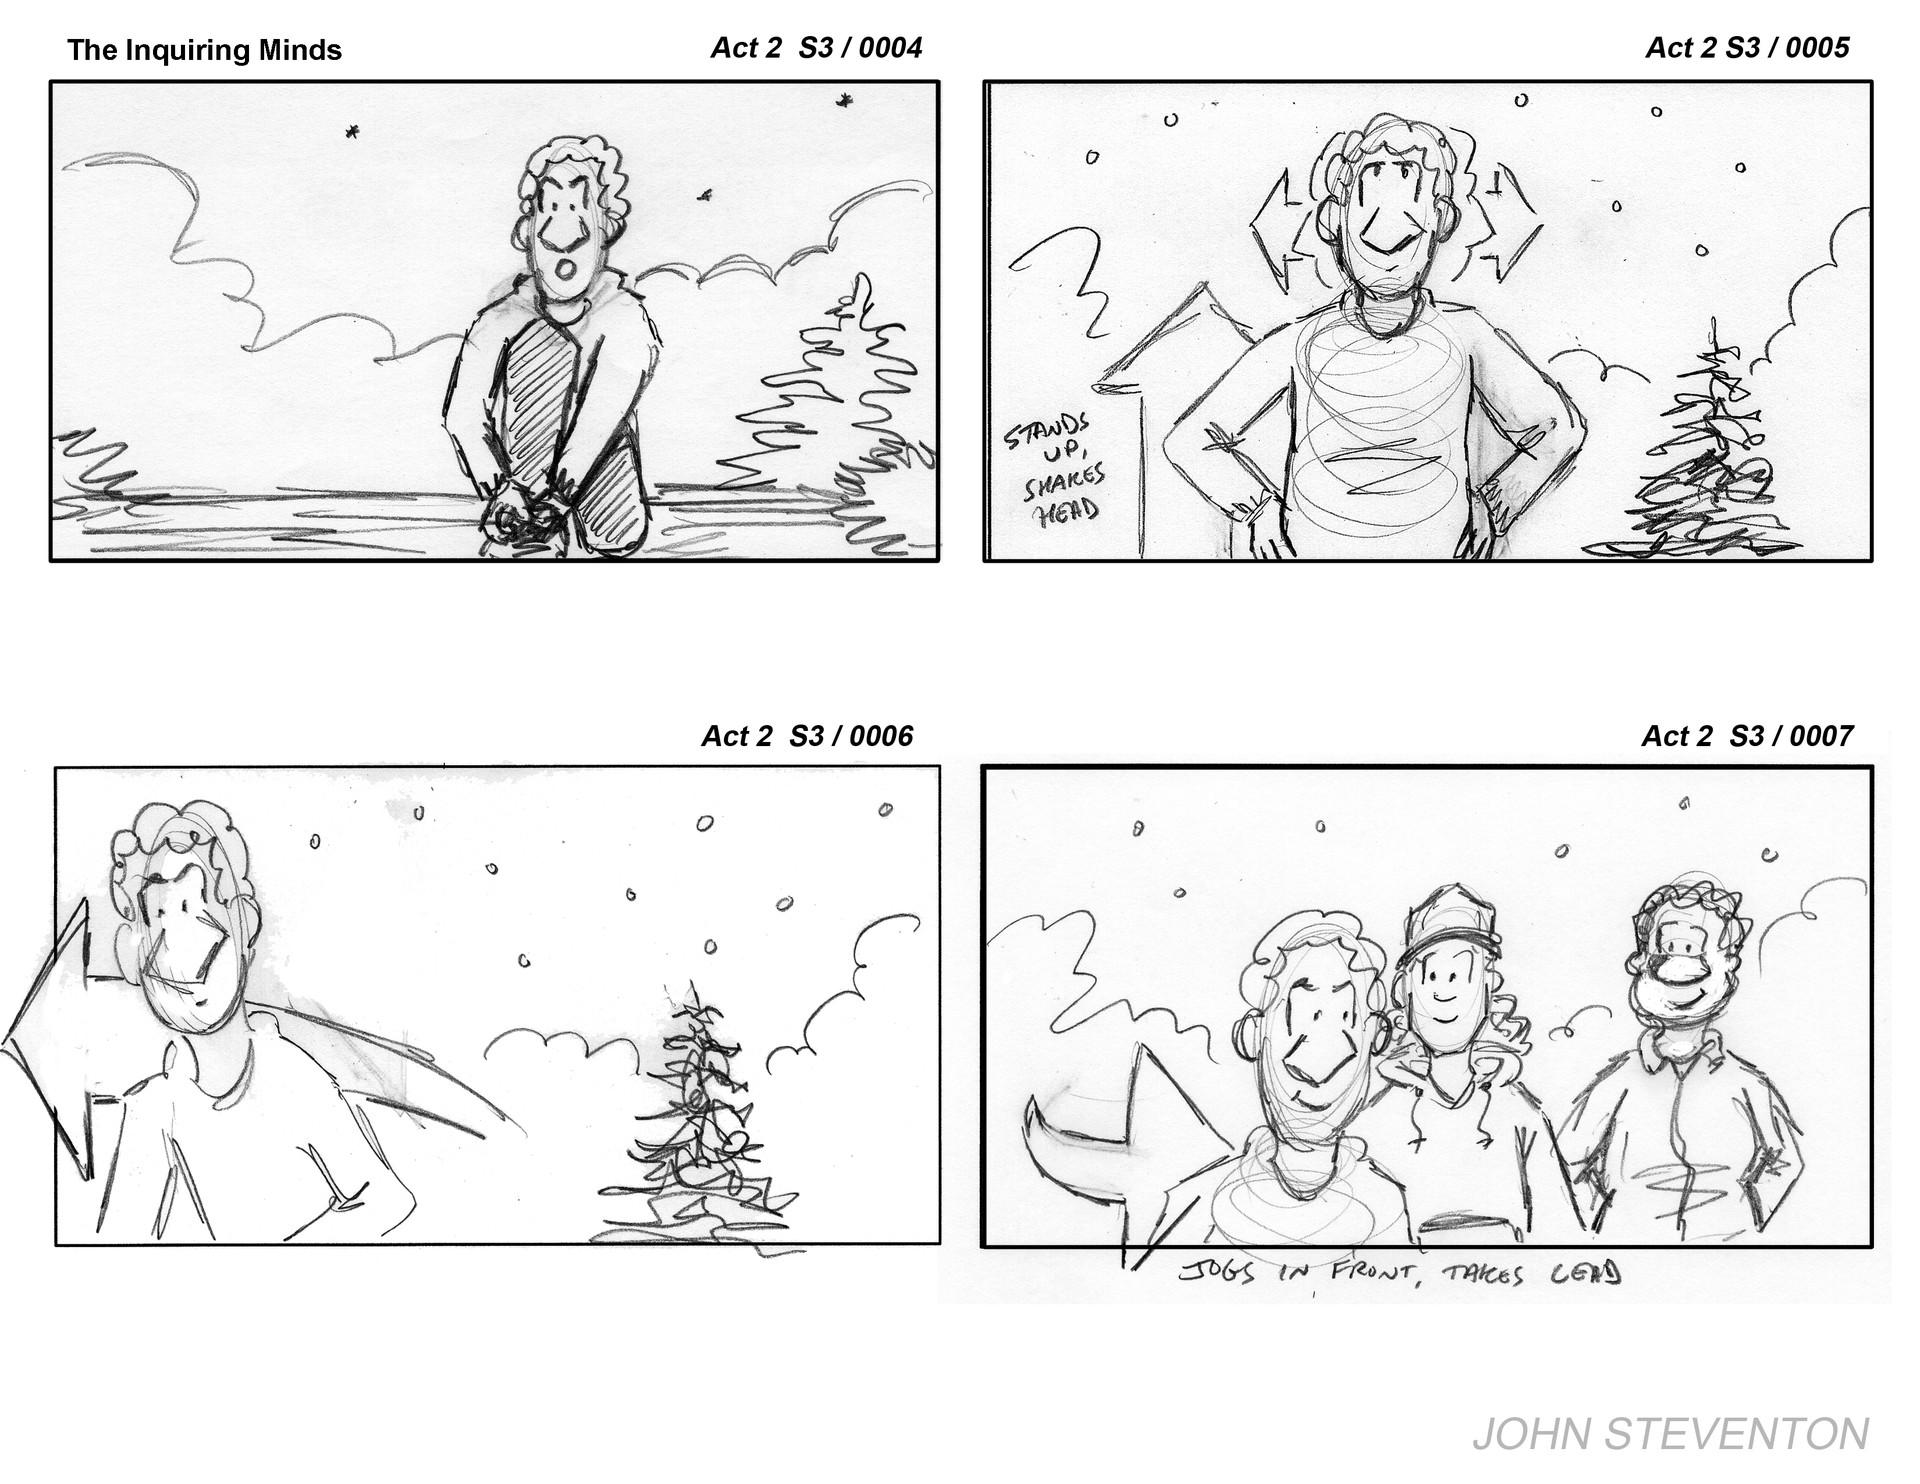 John steventon storyboard 2